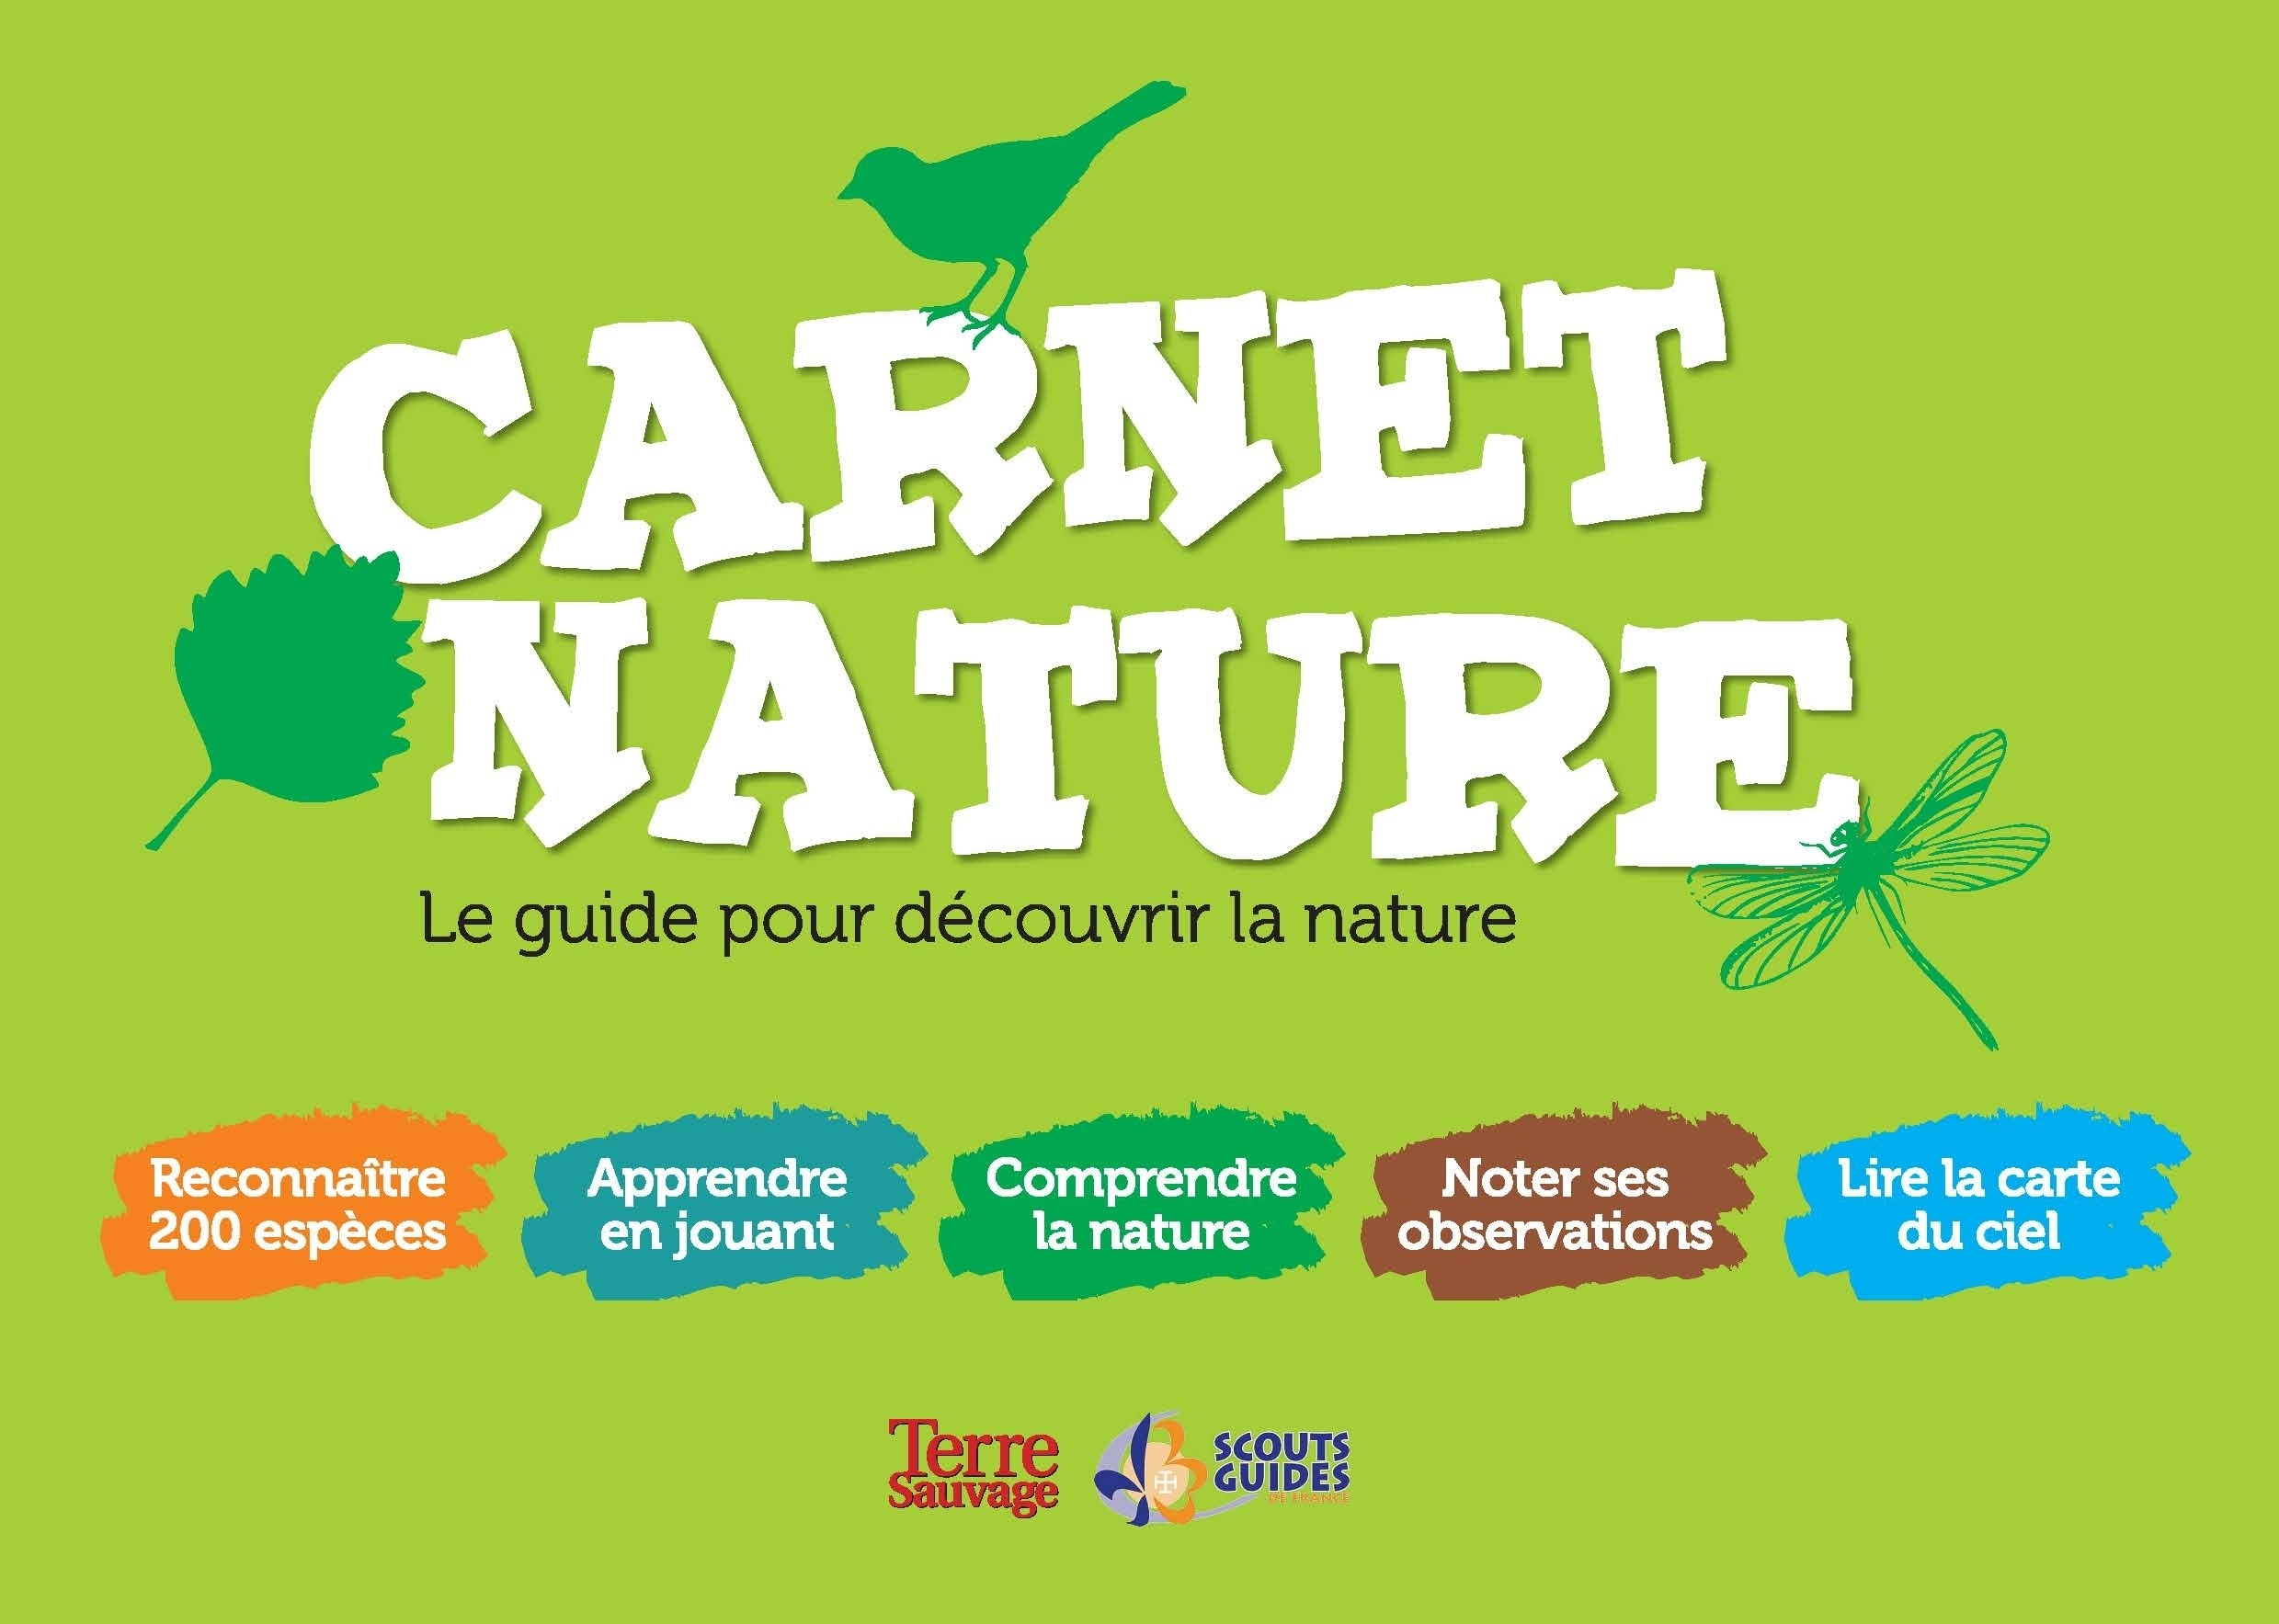 CARNET NATURE